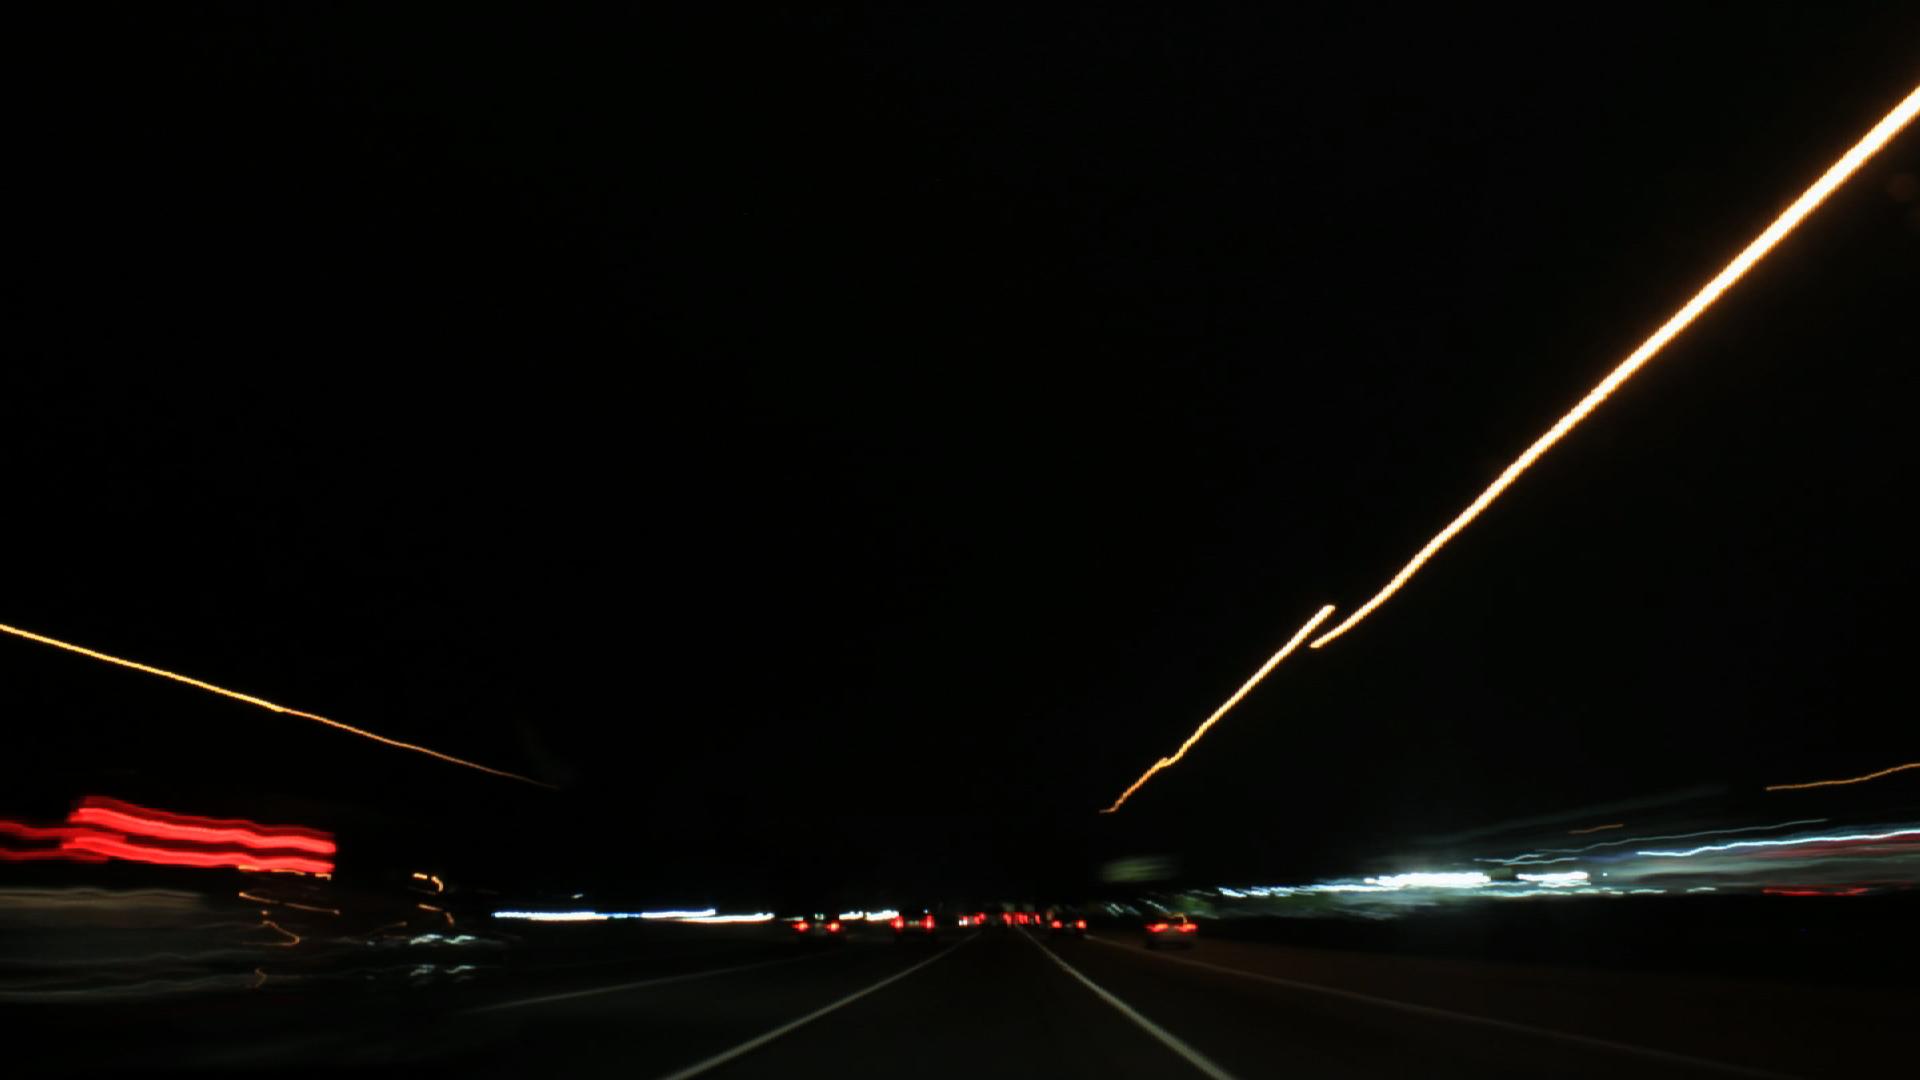 06_15_12_night.png